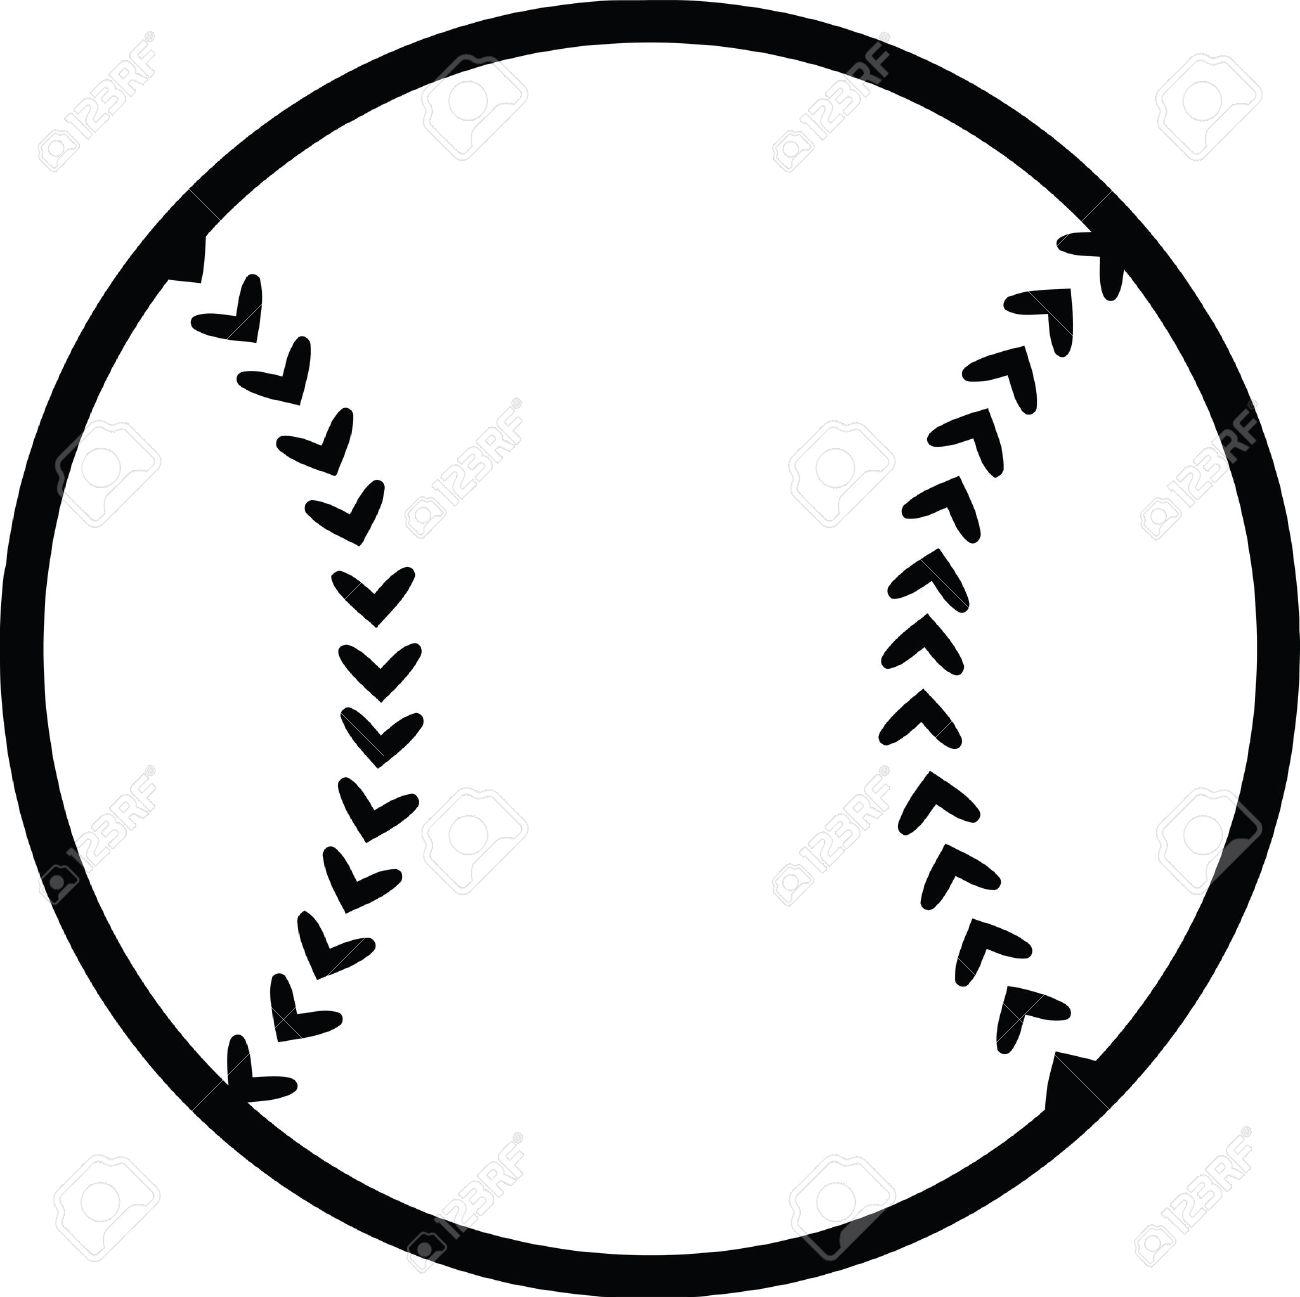 Black and White Baseball Ball Illustration Isolated on white - 28012641